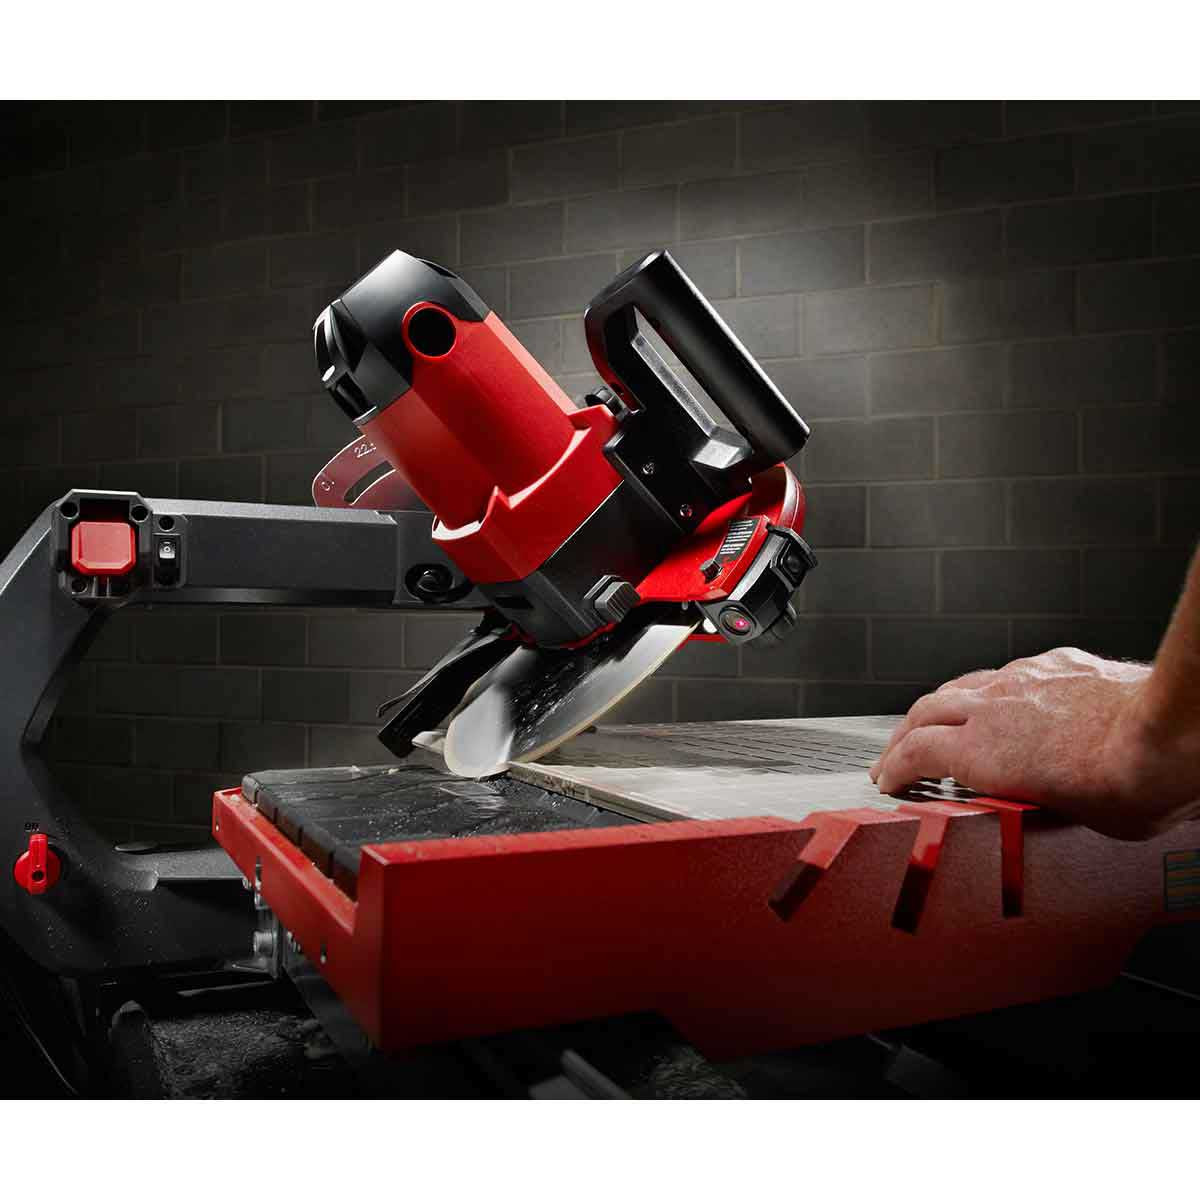 Rubi DT 250 stone cutting saw